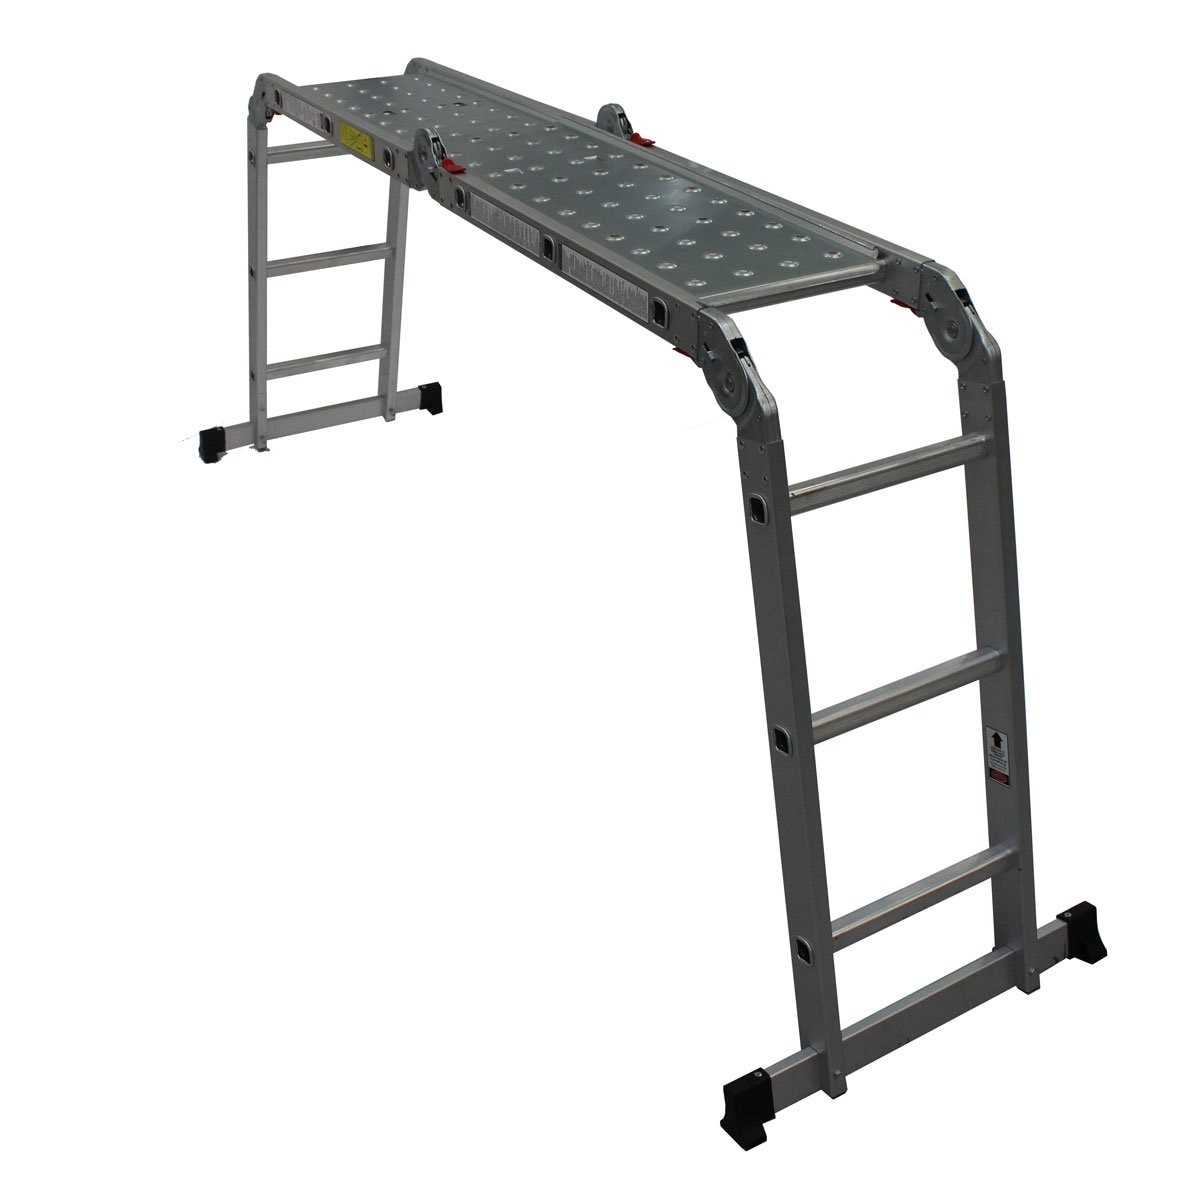 Escalera Multiposiciones de Aluminio Cuprum, Mod C-2096-13